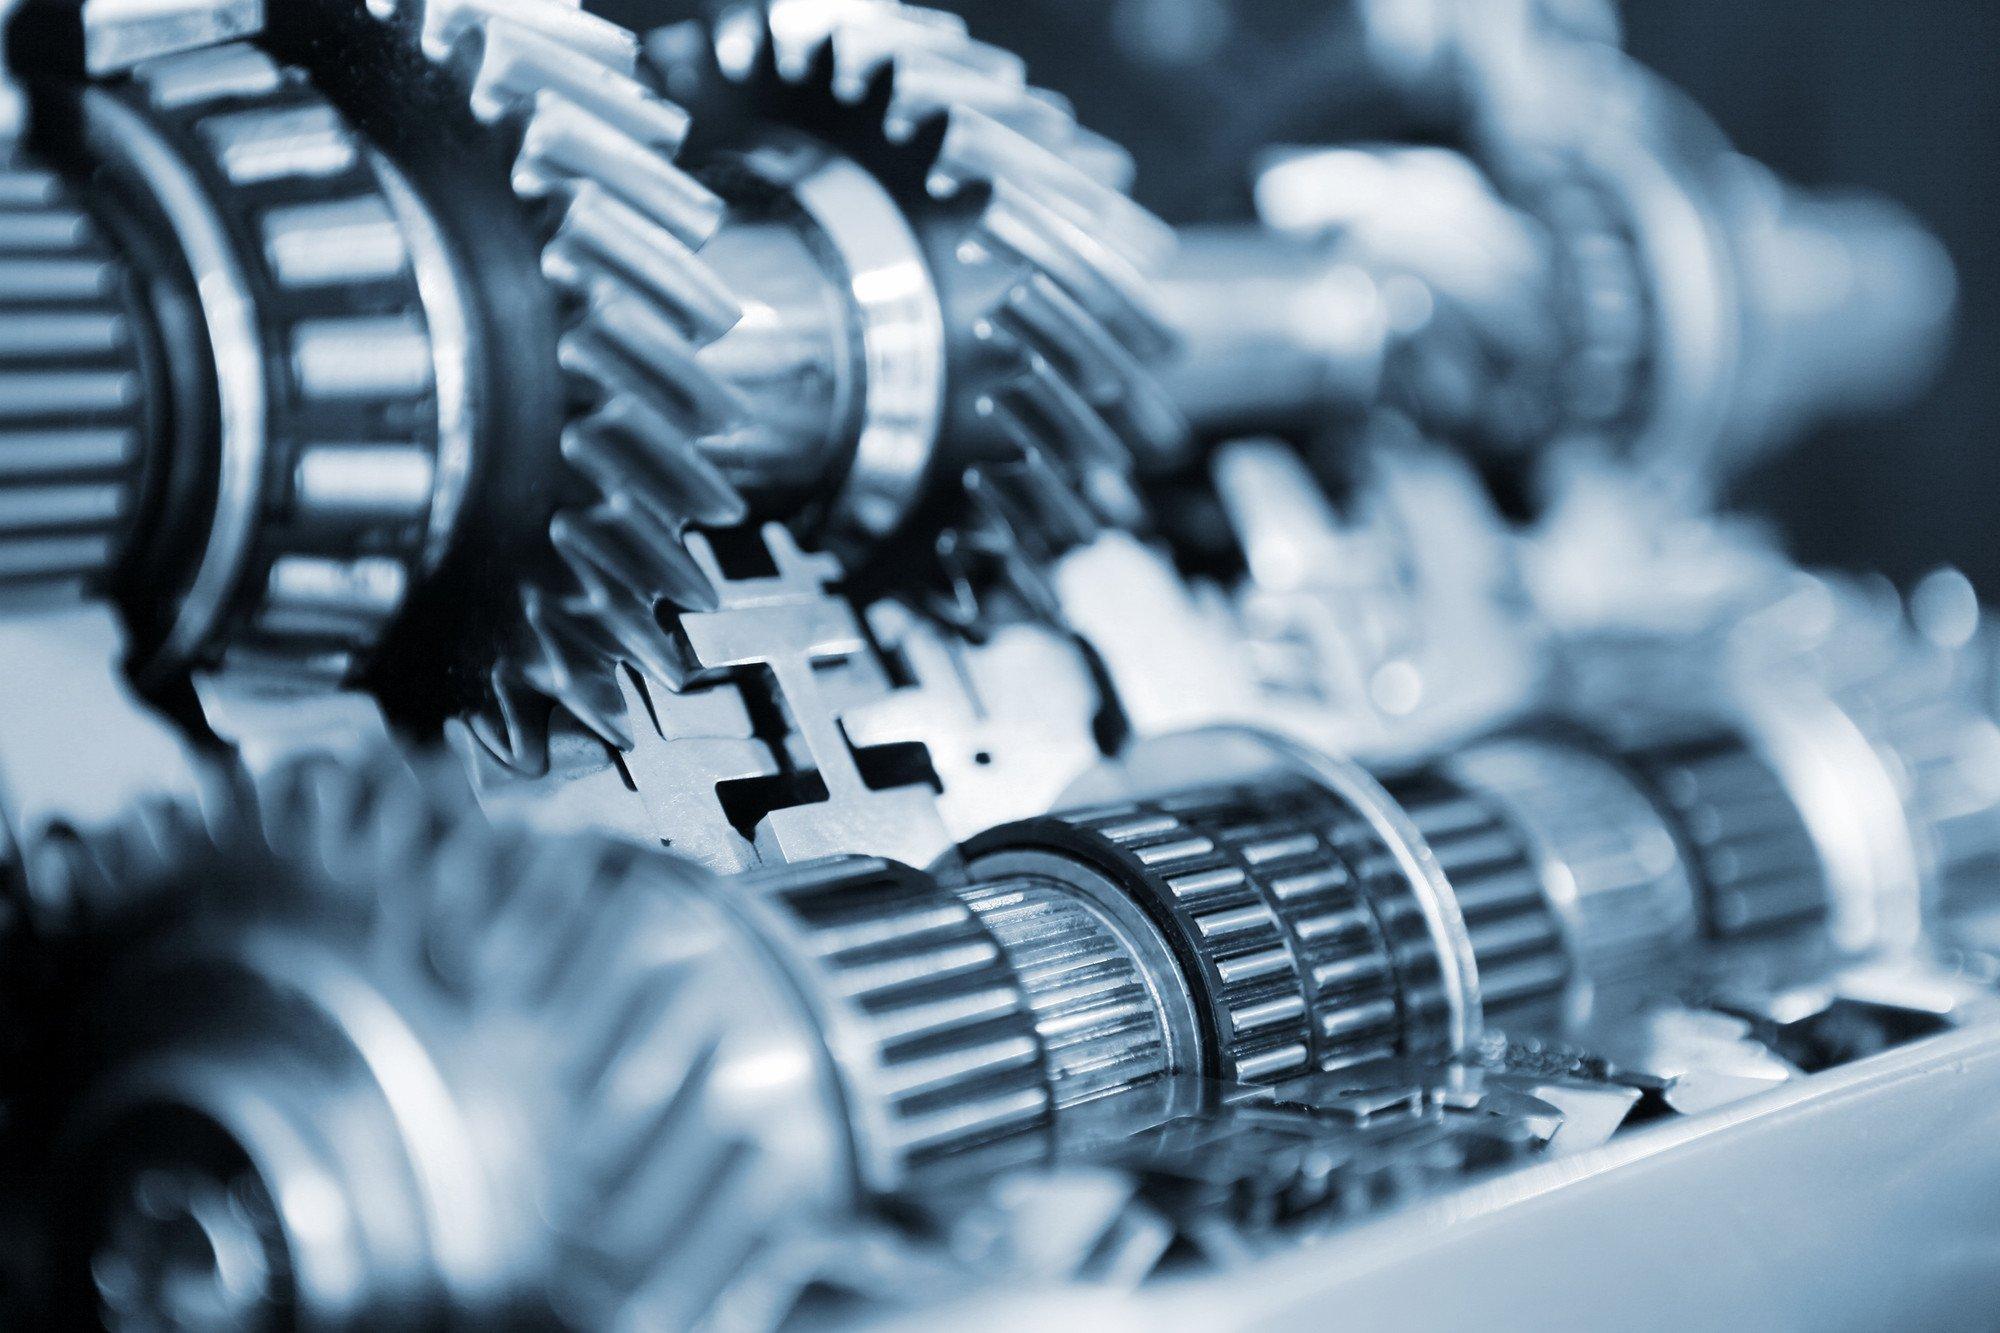 Precision gear specialists